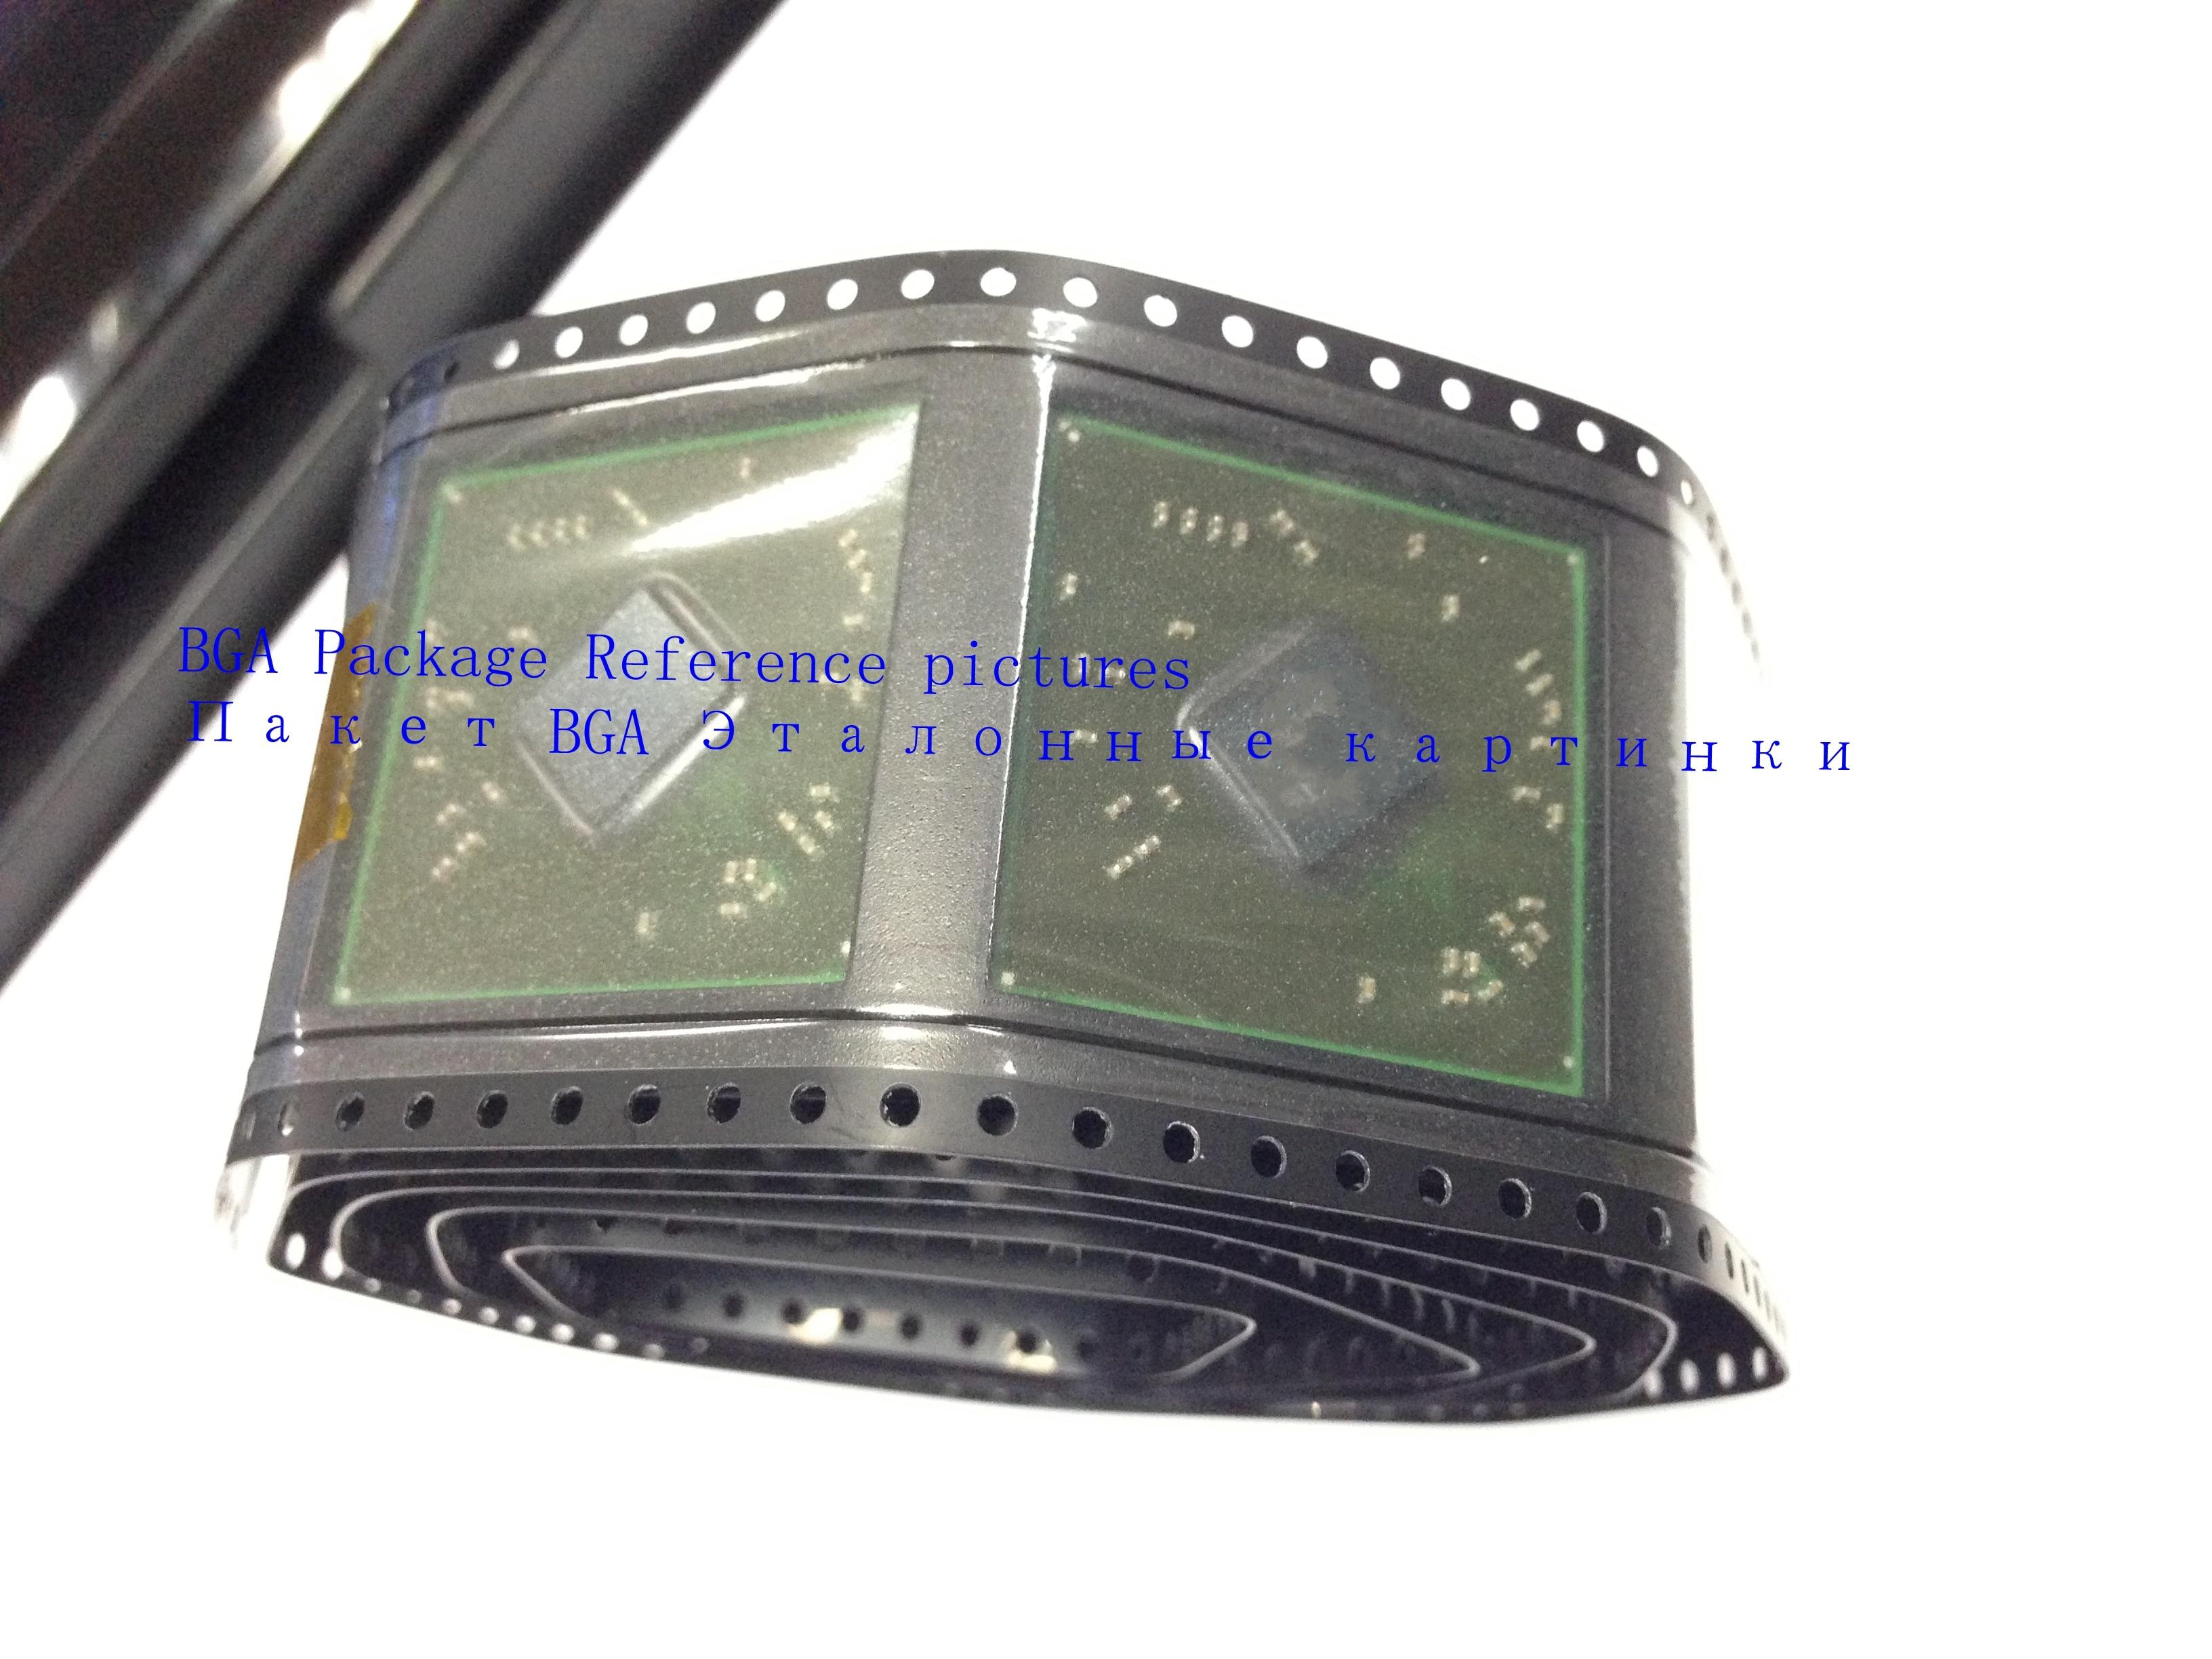 1pcs/lot 100% New 218-0755046 218 0755046 BGA Chipset1pcs/lot 100% New 218-0755046 218 0755046 BGA Chipset